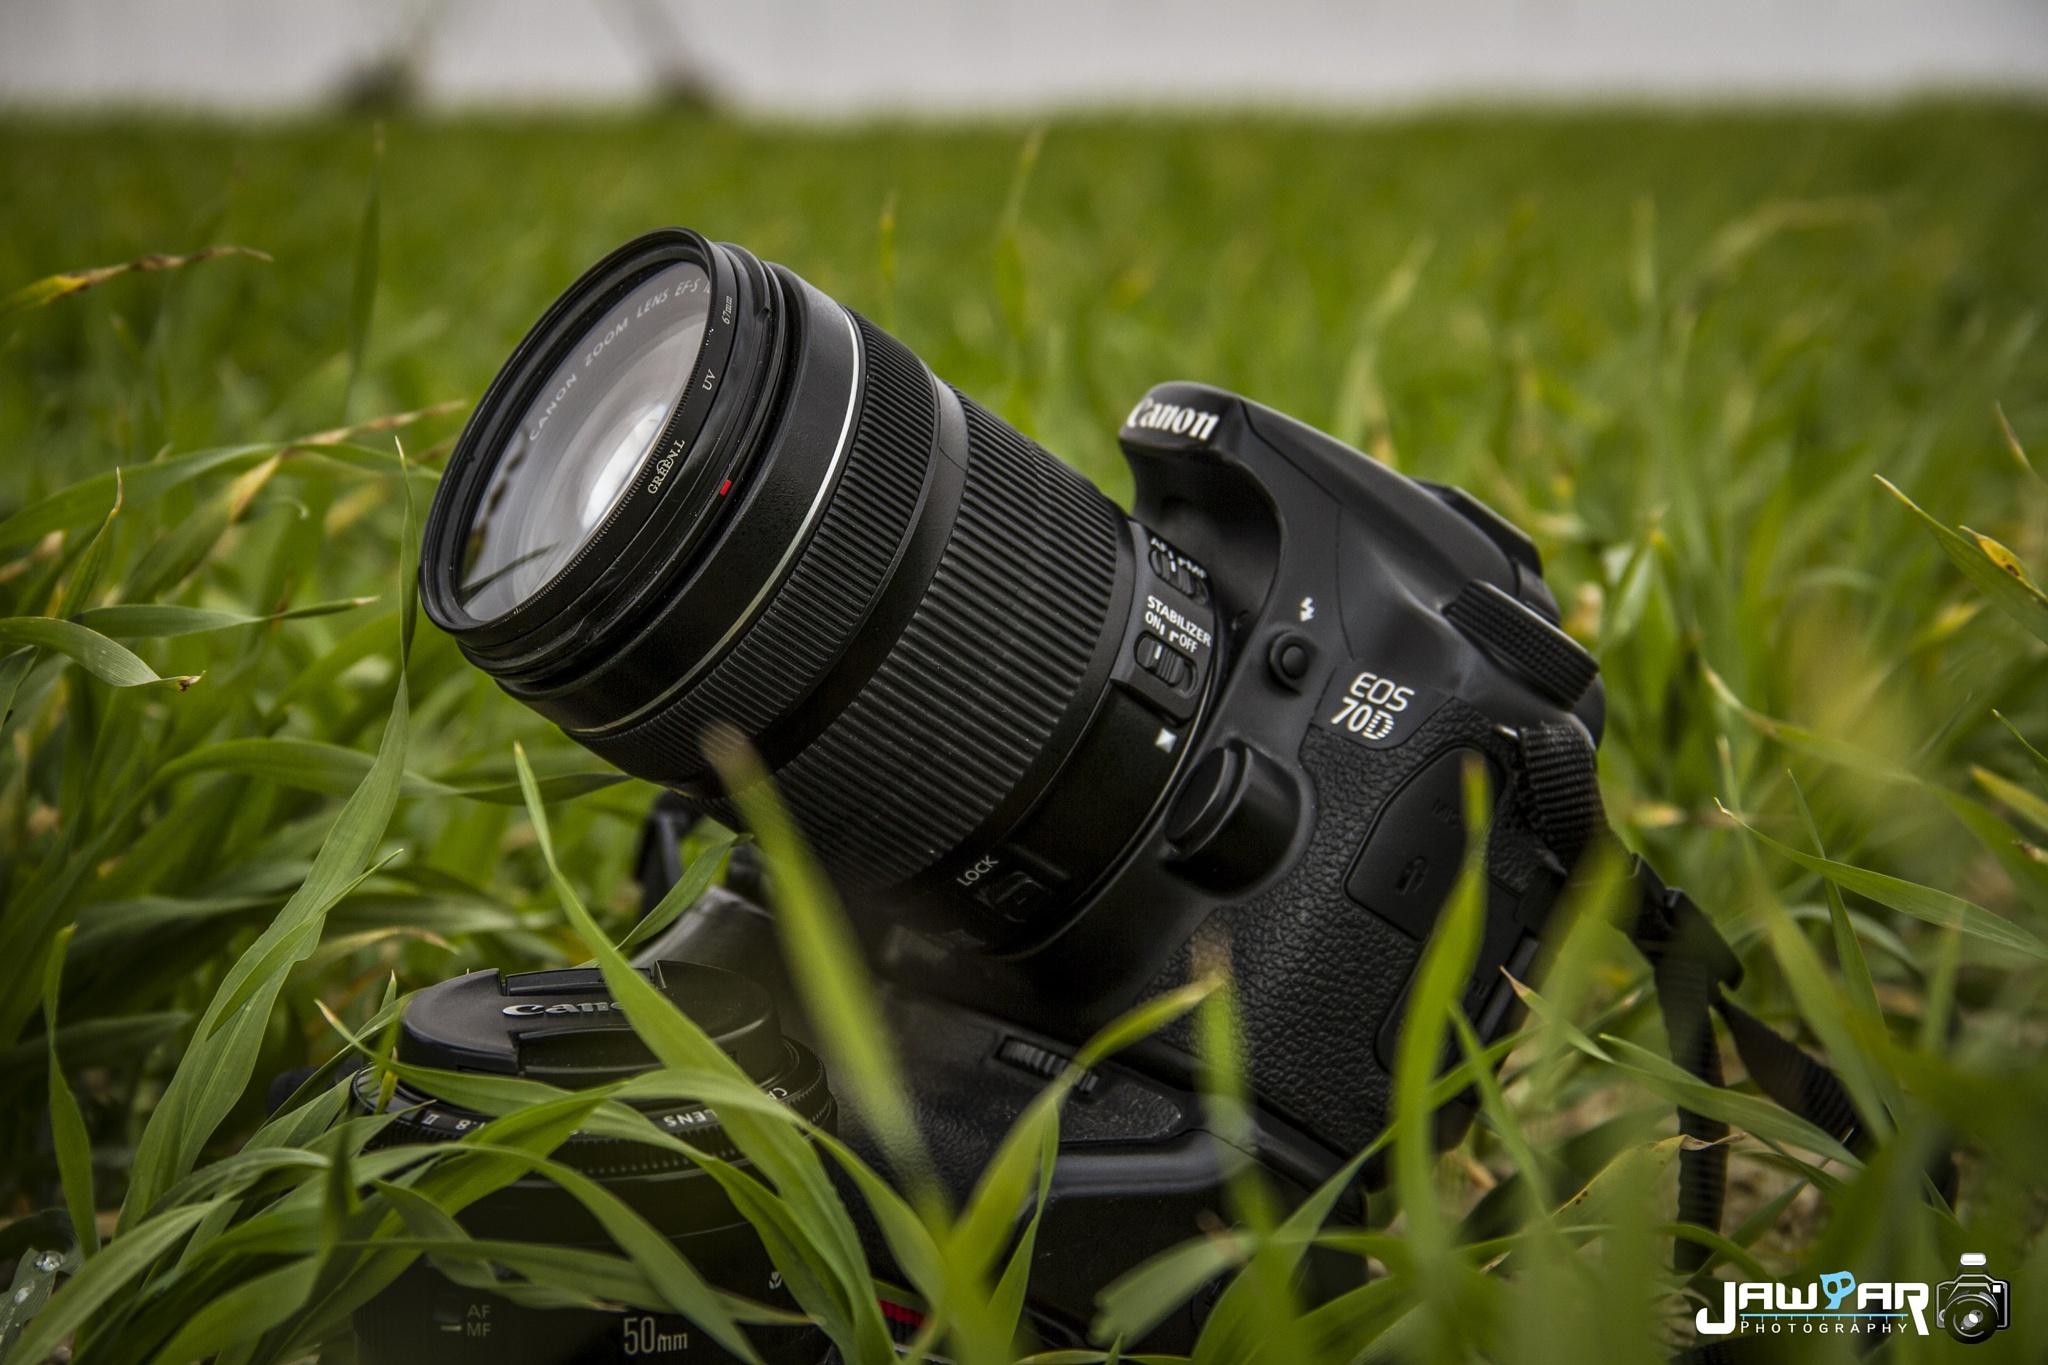 Canon EOS 70D by Jawhar Skat